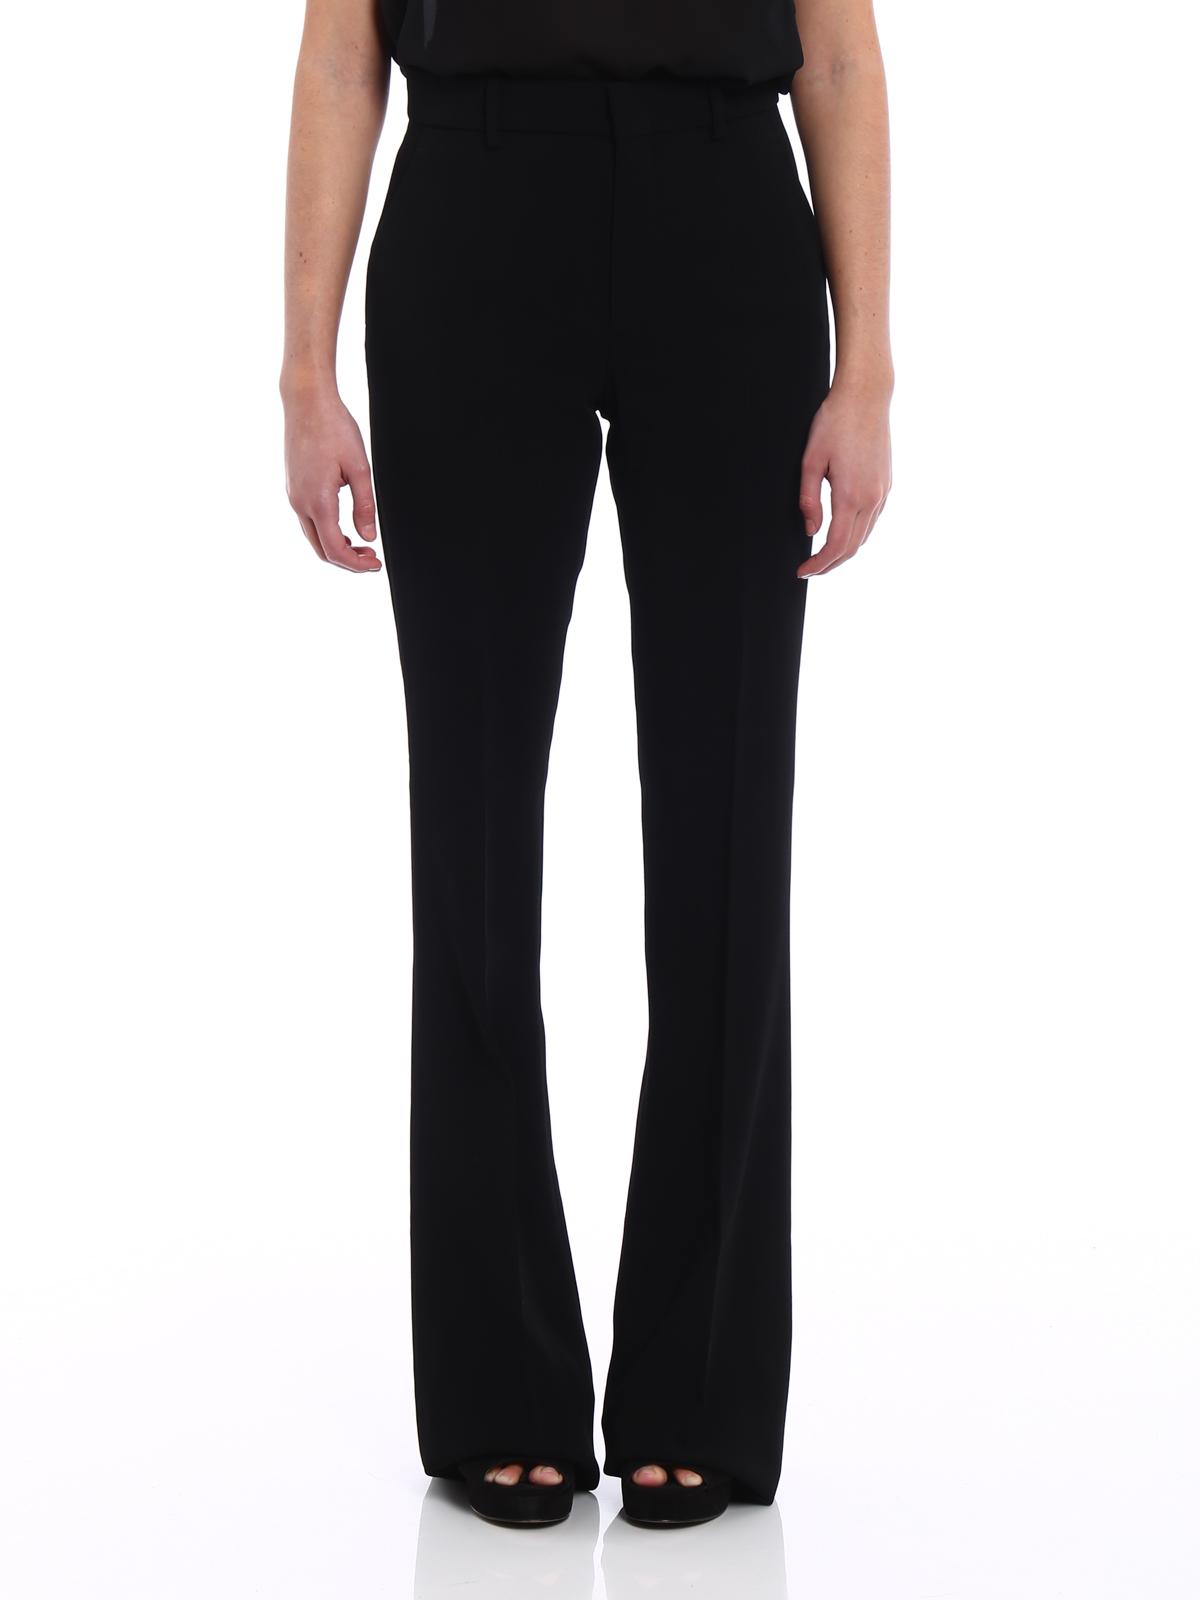 Cady Flared Pants - Black Gucci fG4u5EdG